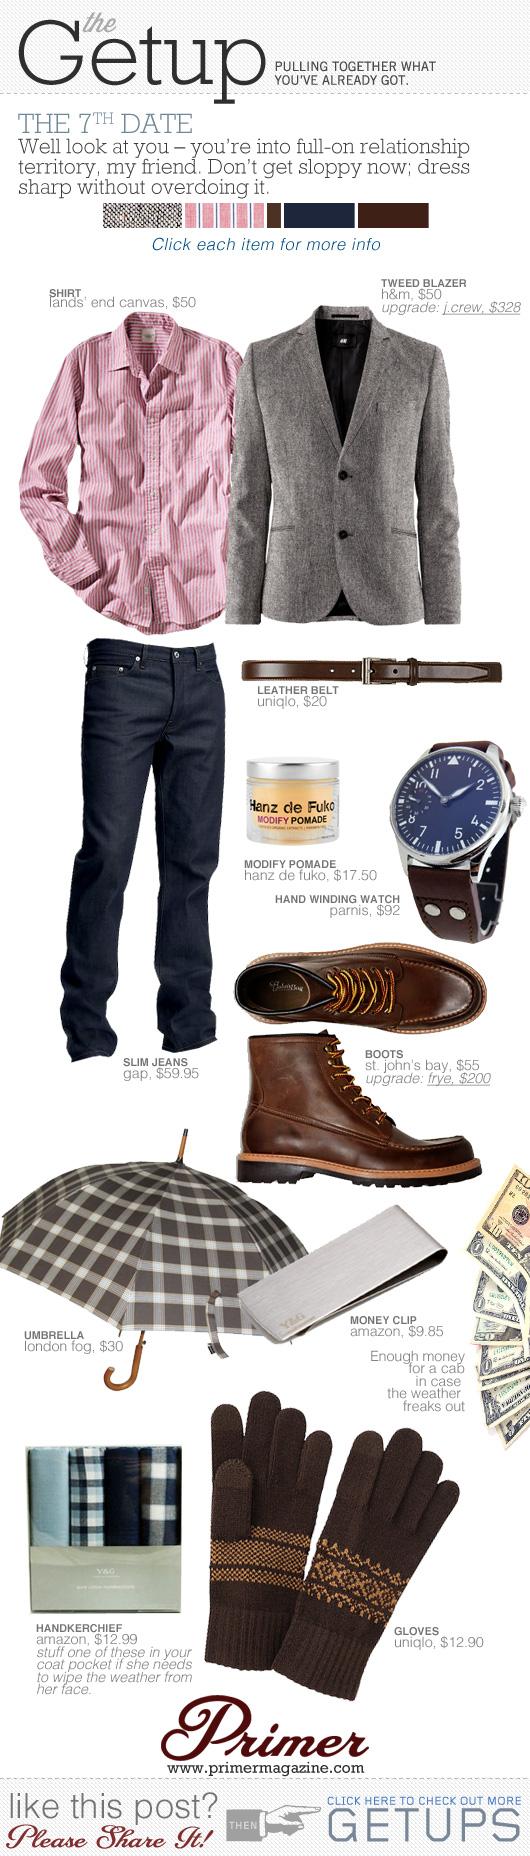 Getup 7th Date - blazer, pink shirt, dark jeans, moc toe boots